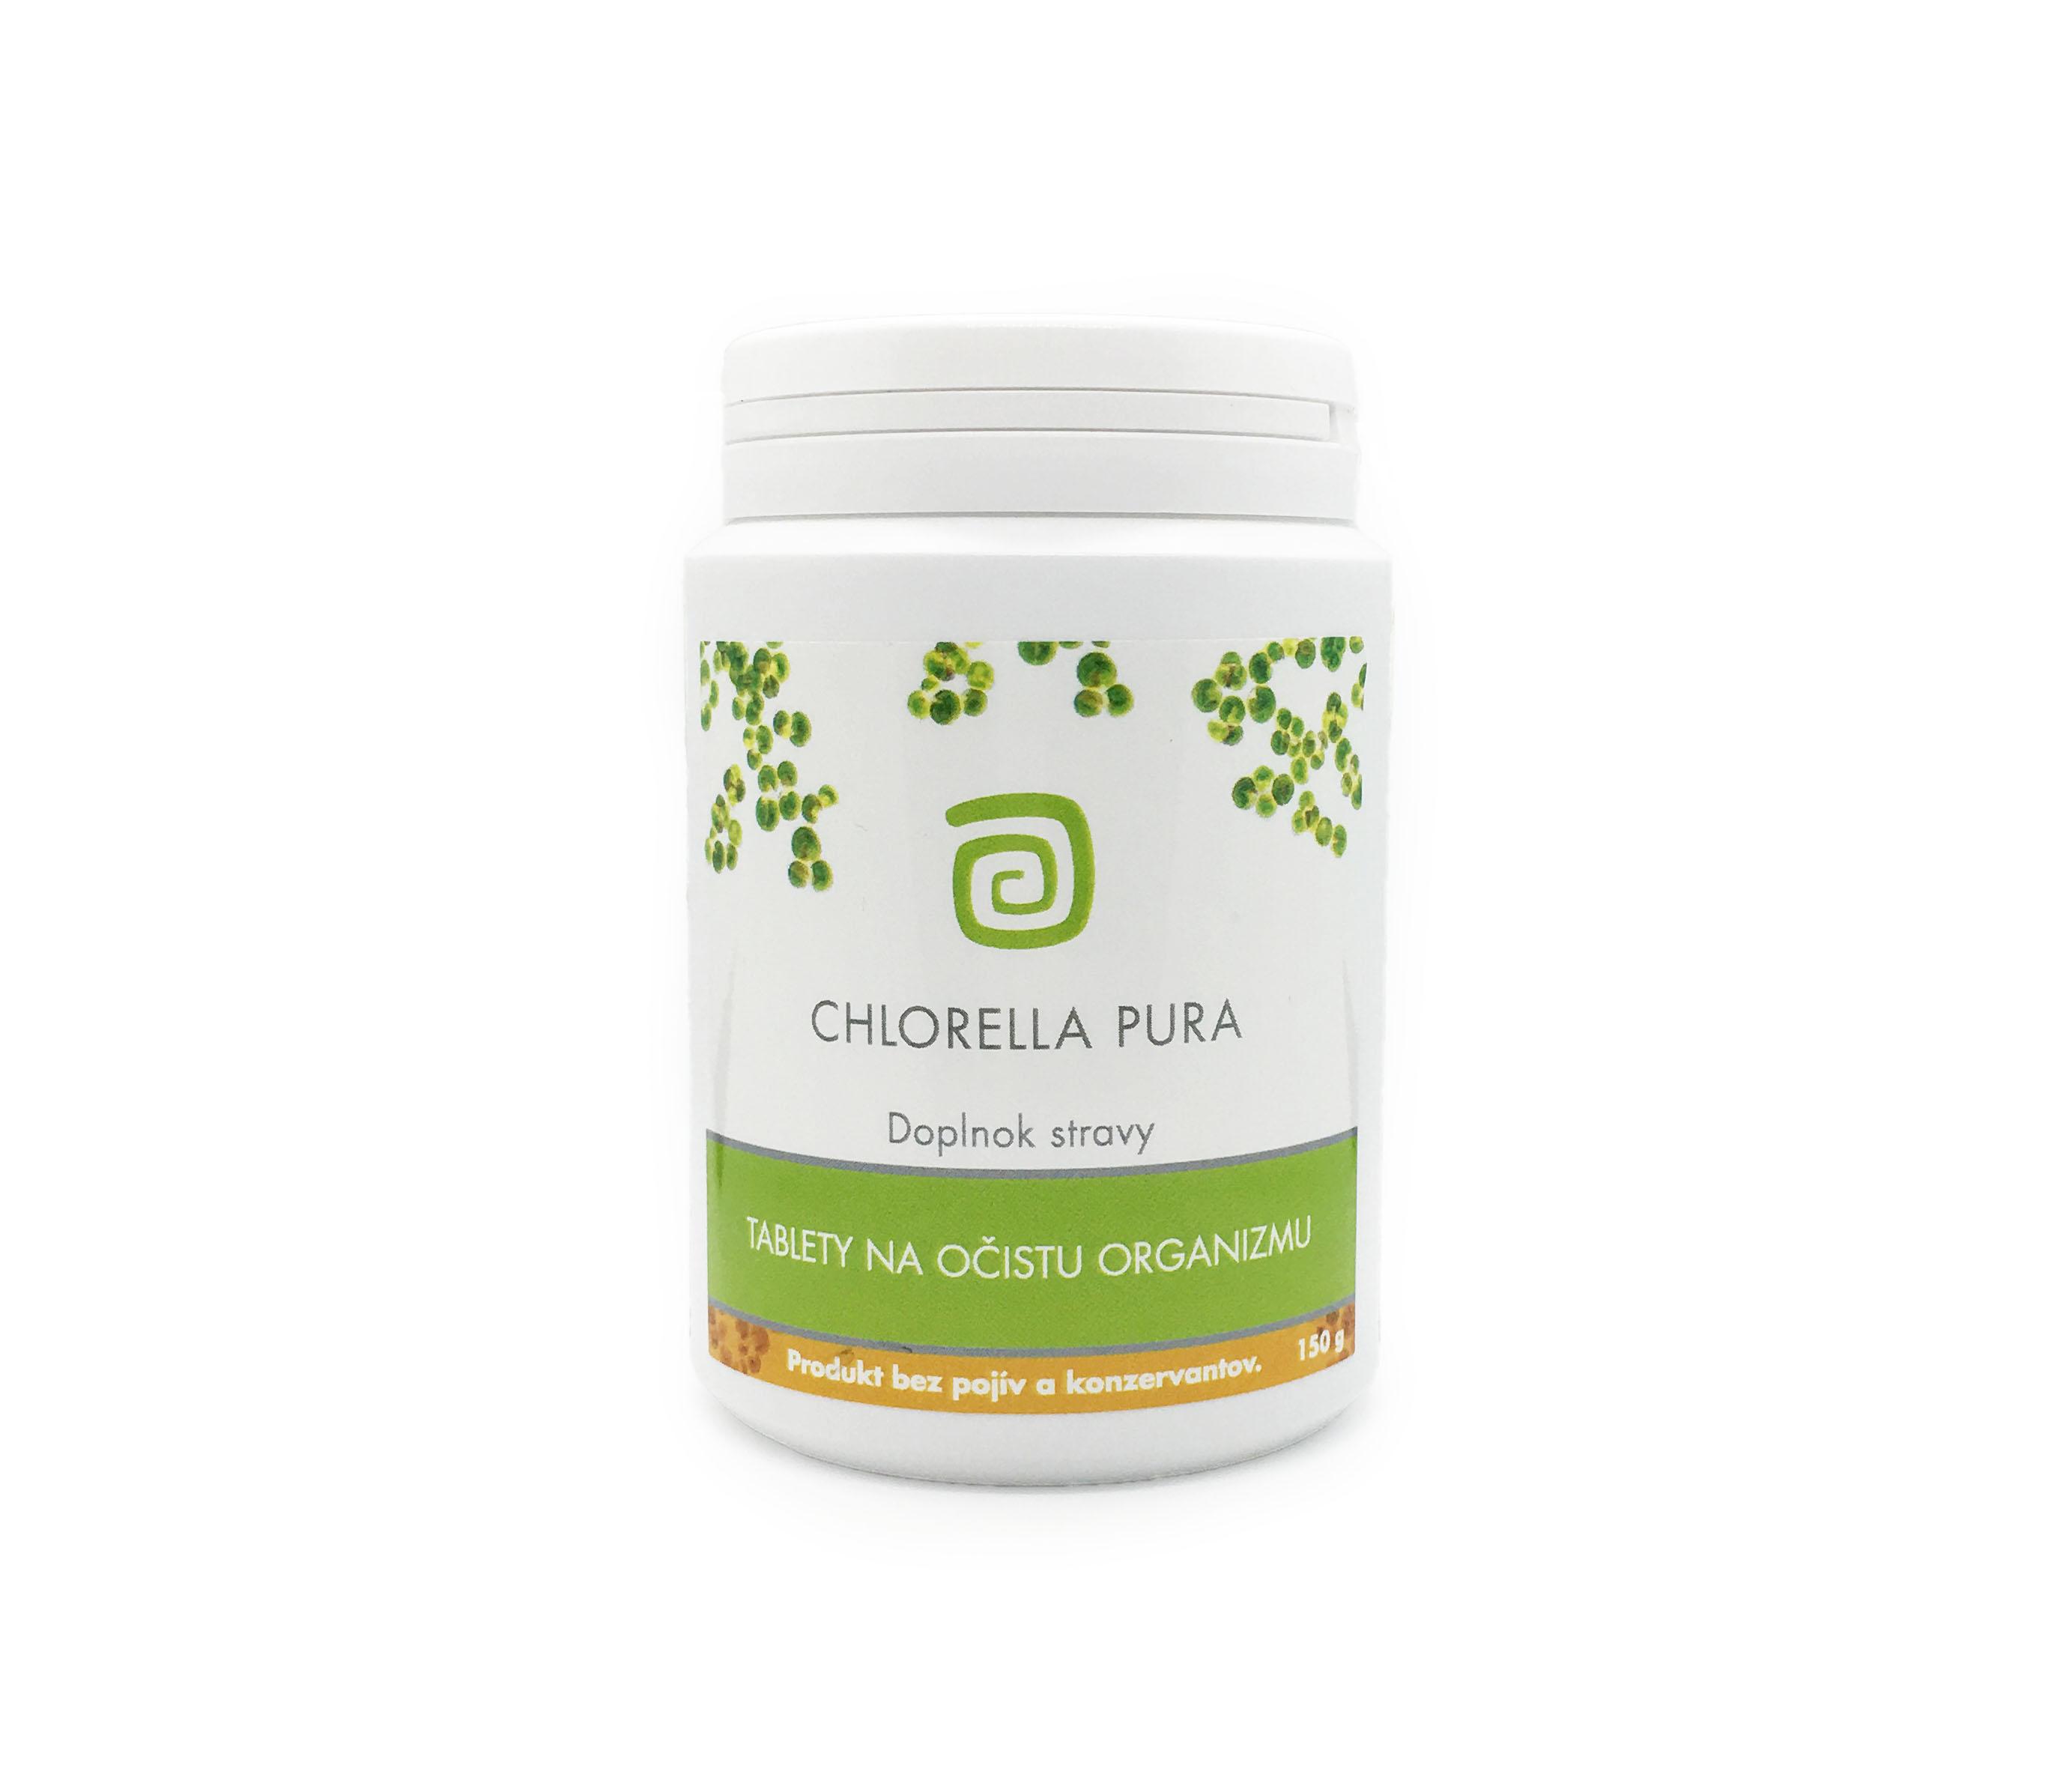 Chlorella Pura